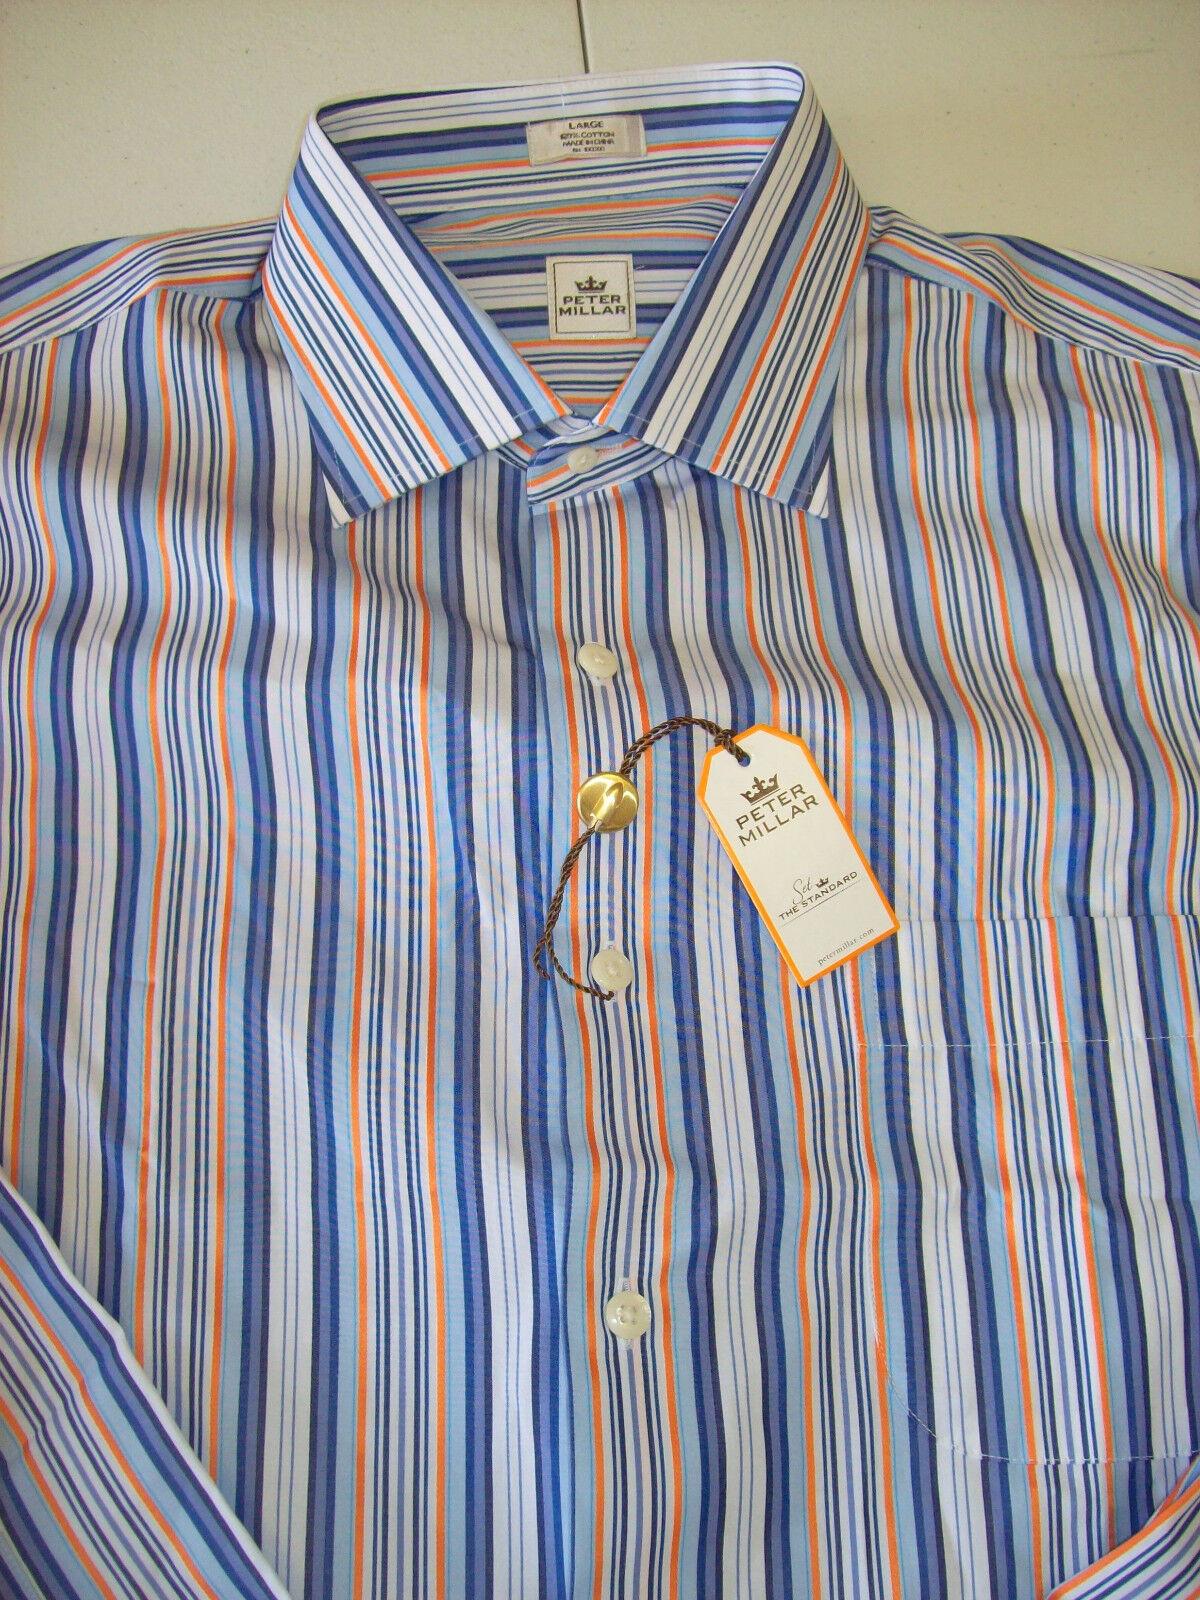 Peter Millar Woven Cotton bluee Striped Shirt NWT Large   Spread Collar